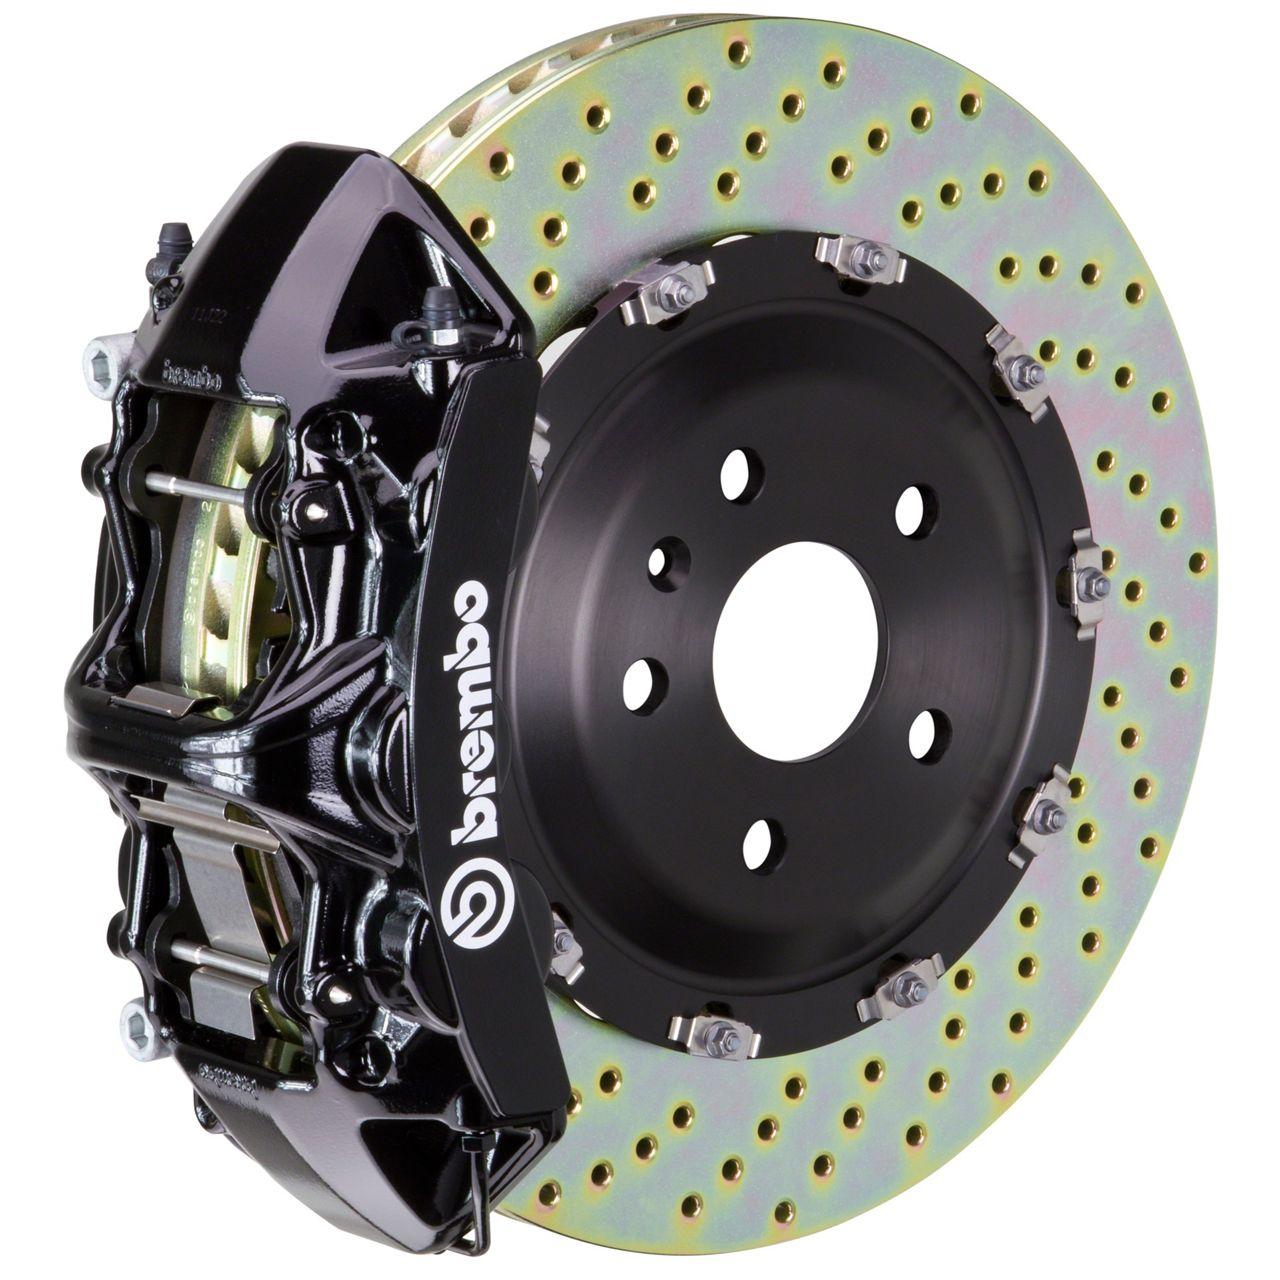 Brembo GT Series 6-Piston Front Big Brake Kit - 15 in. 2-Piece Cross-Drilled Rotors - Black (08-14 SRT8)